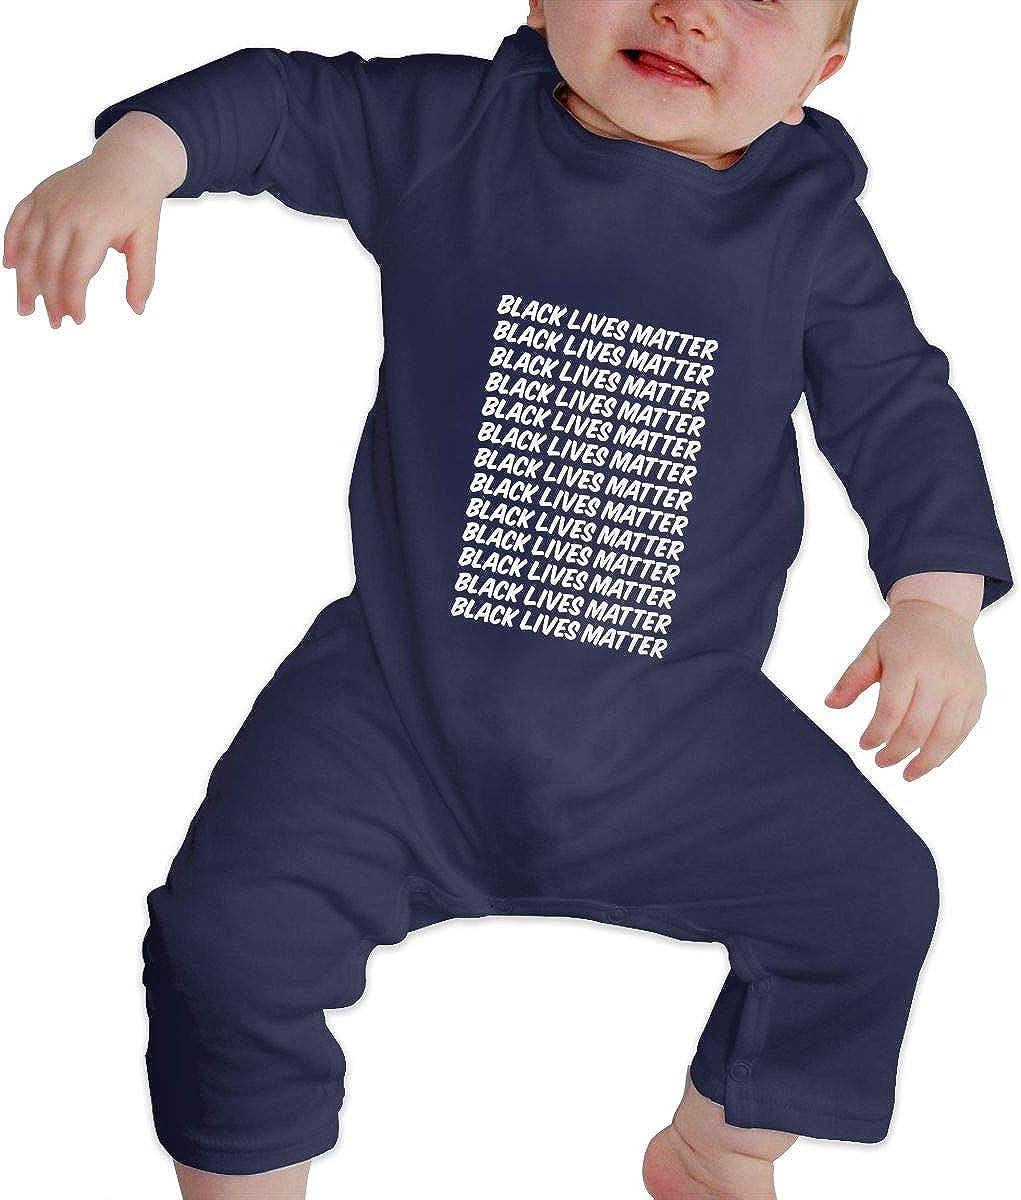 Black Lives Matter Toddler Footed Romper Onesie Unisex Baby Bodysuit Long Sleeve